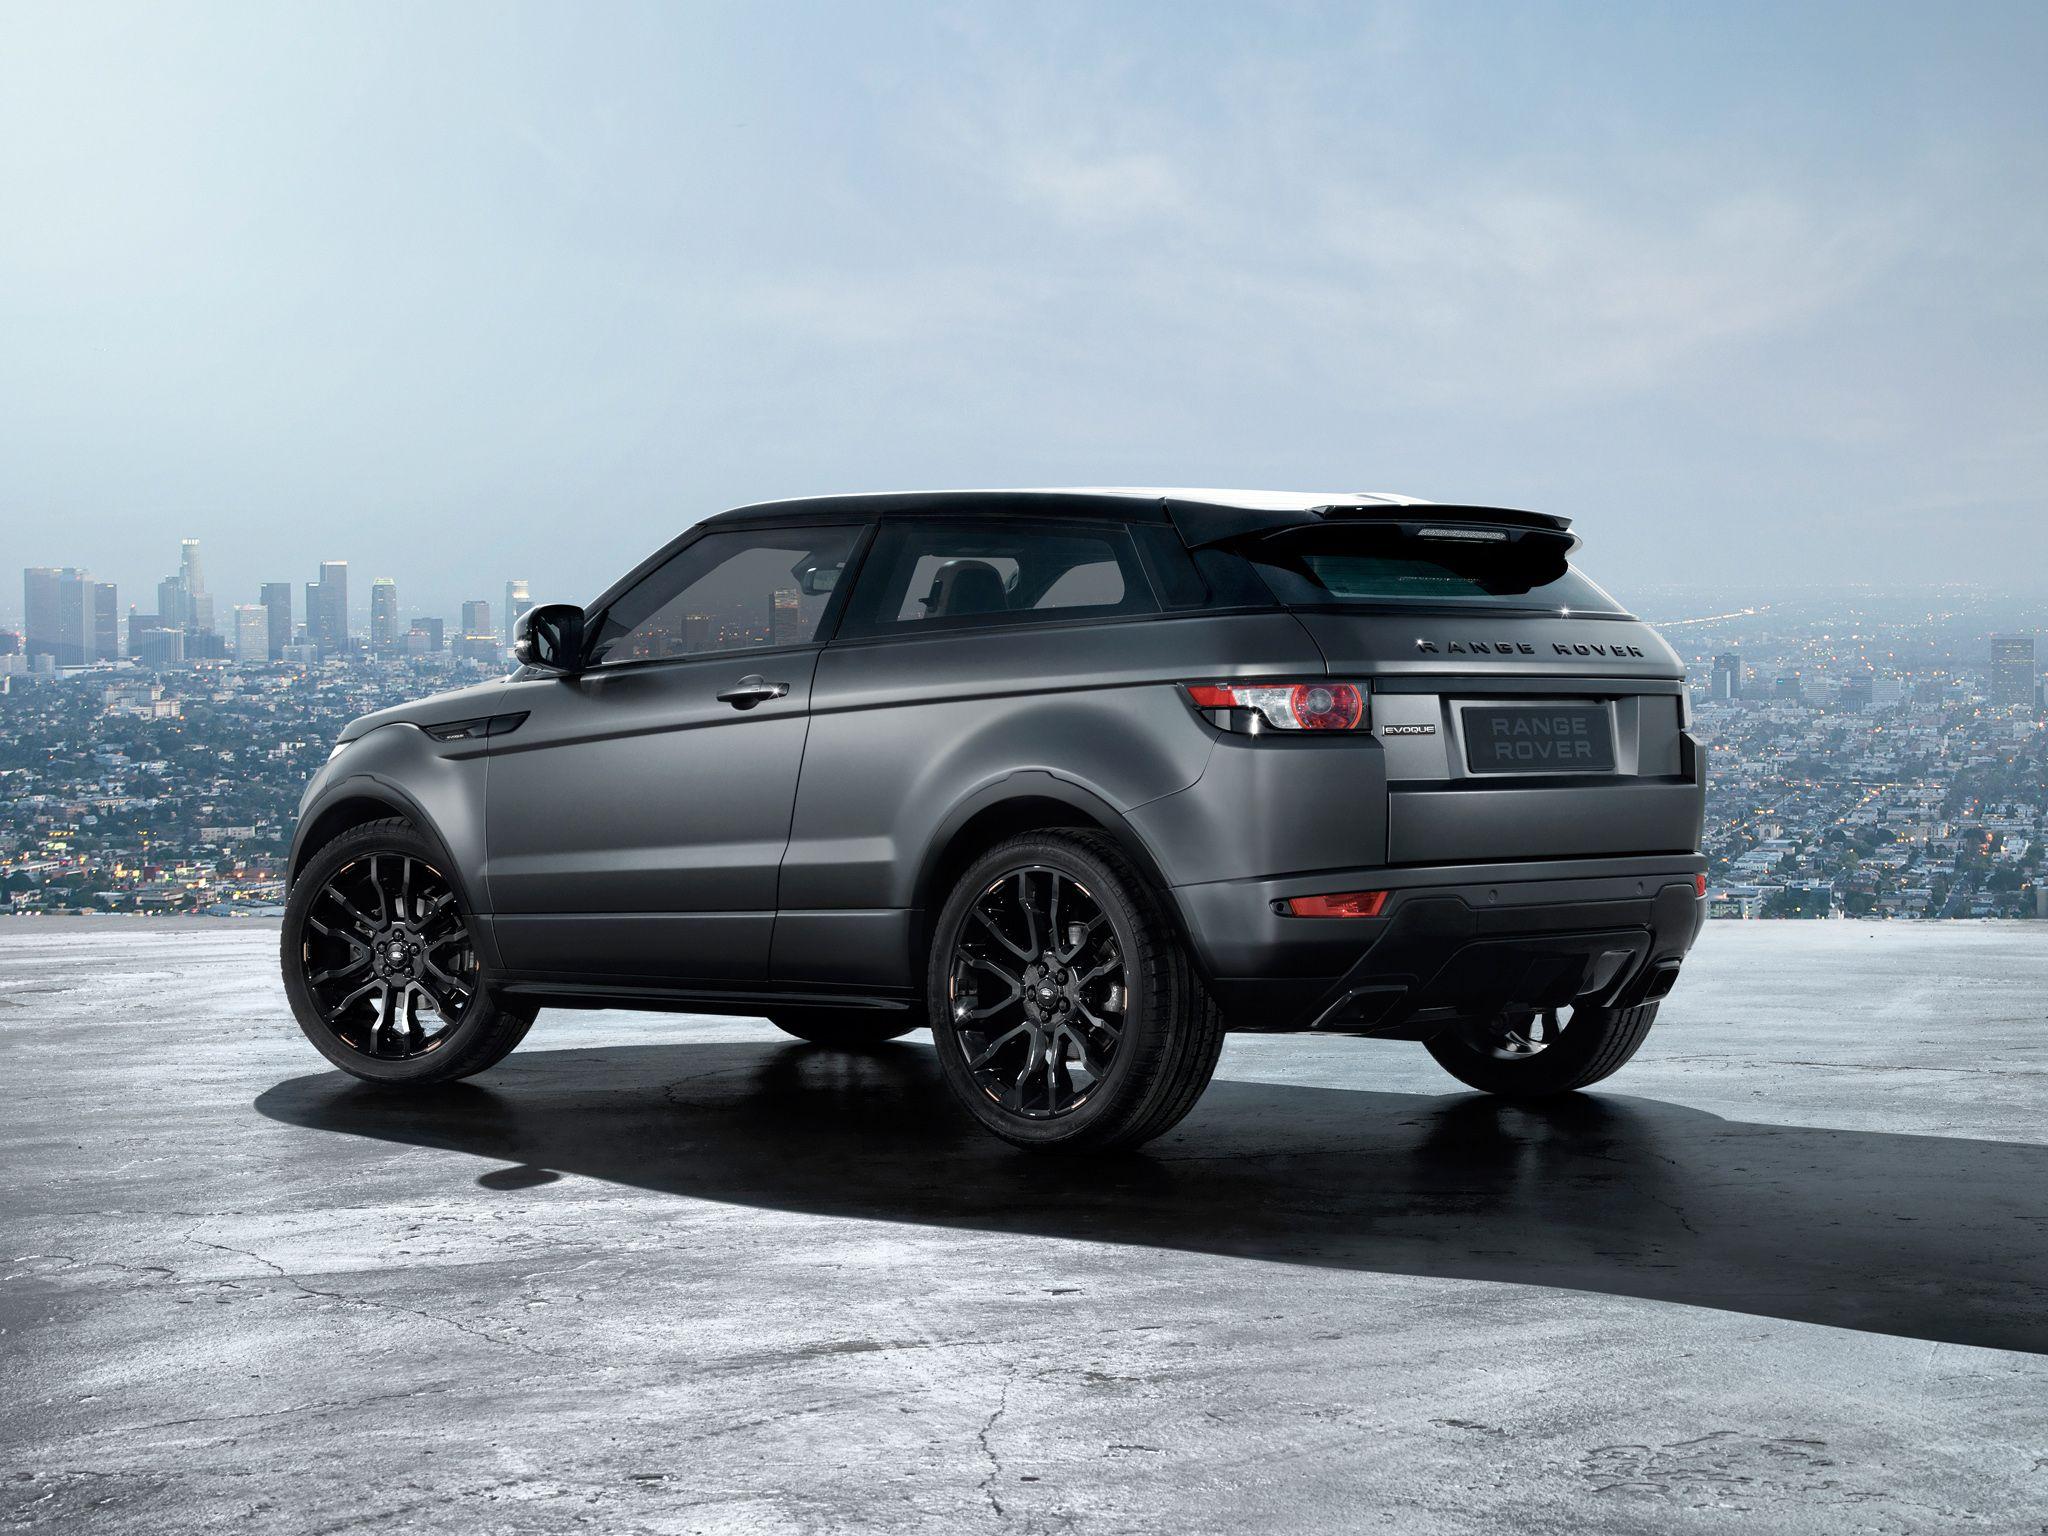 2012 Land Rover Range Rover Evoque For more detailhttps